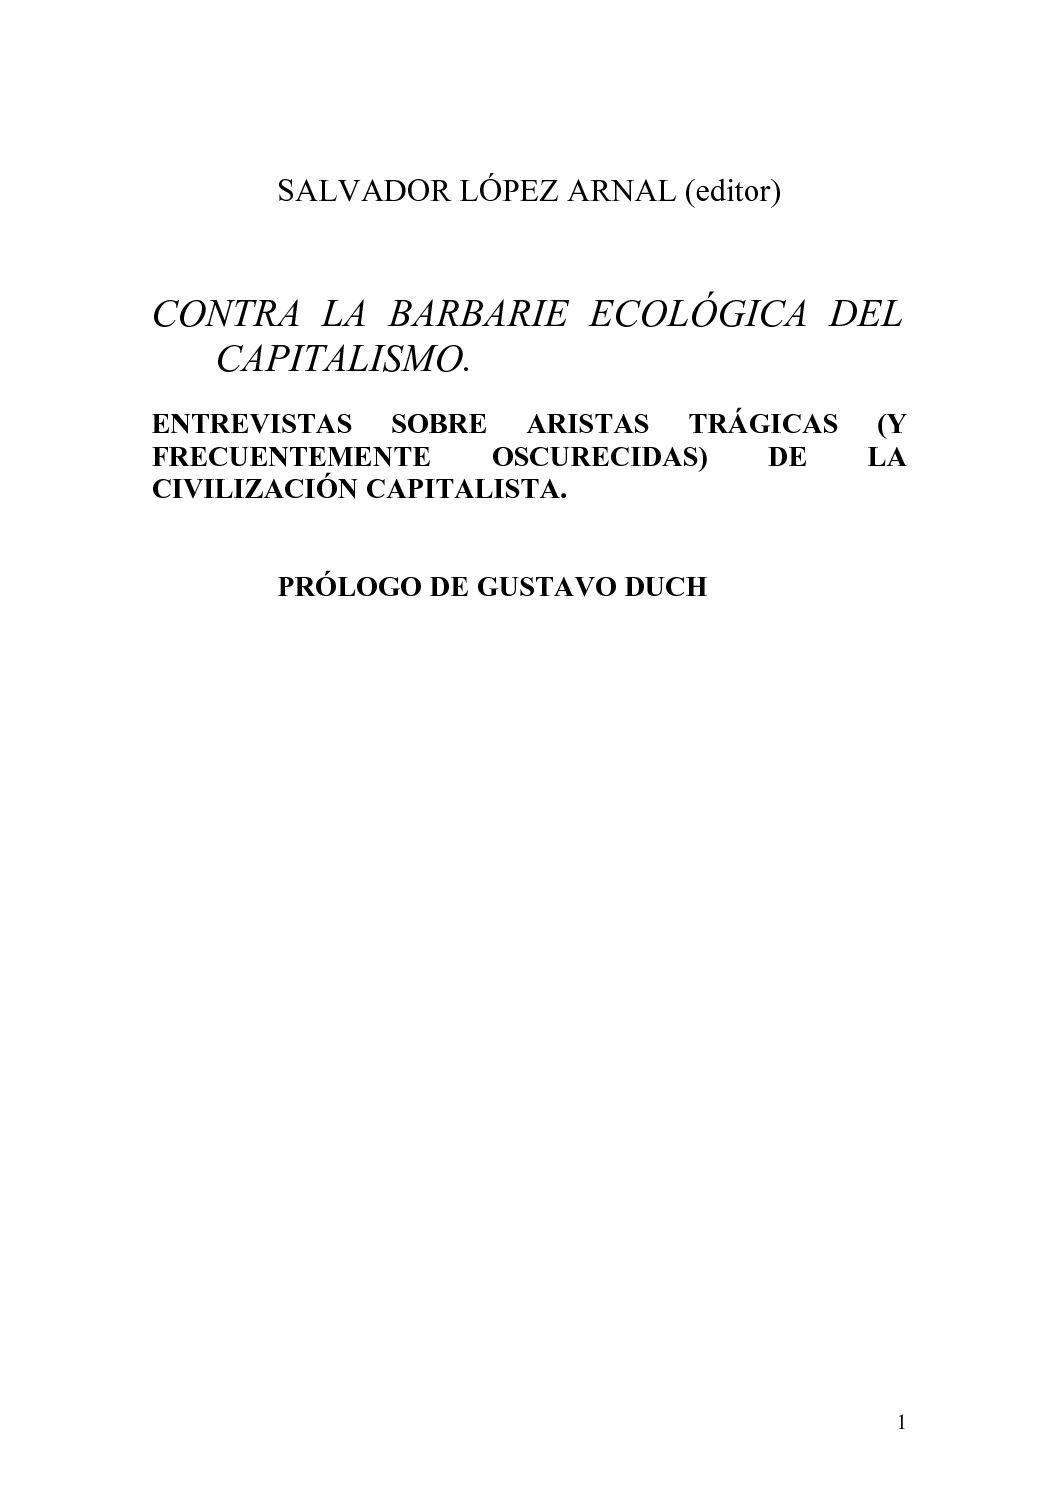 Calaméo - SALVADOR LÓPEZ ARNAL (editor). CONTRA LA BARBARIE ...